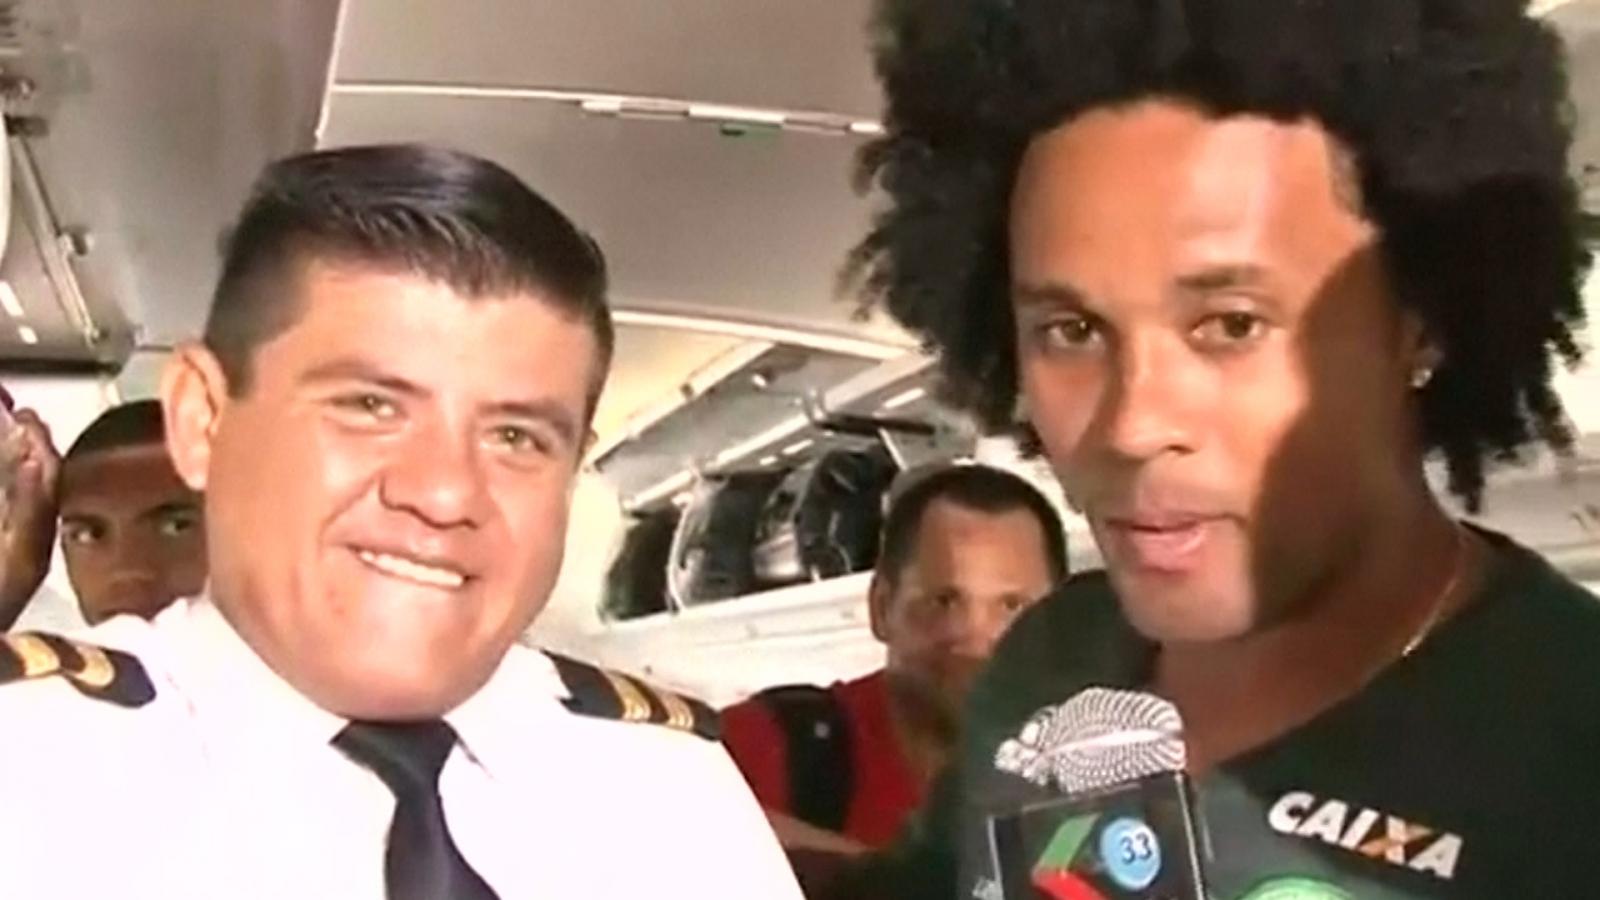 Chapecoense tragedy: Pilot and crew filmed joking on board doomed flight